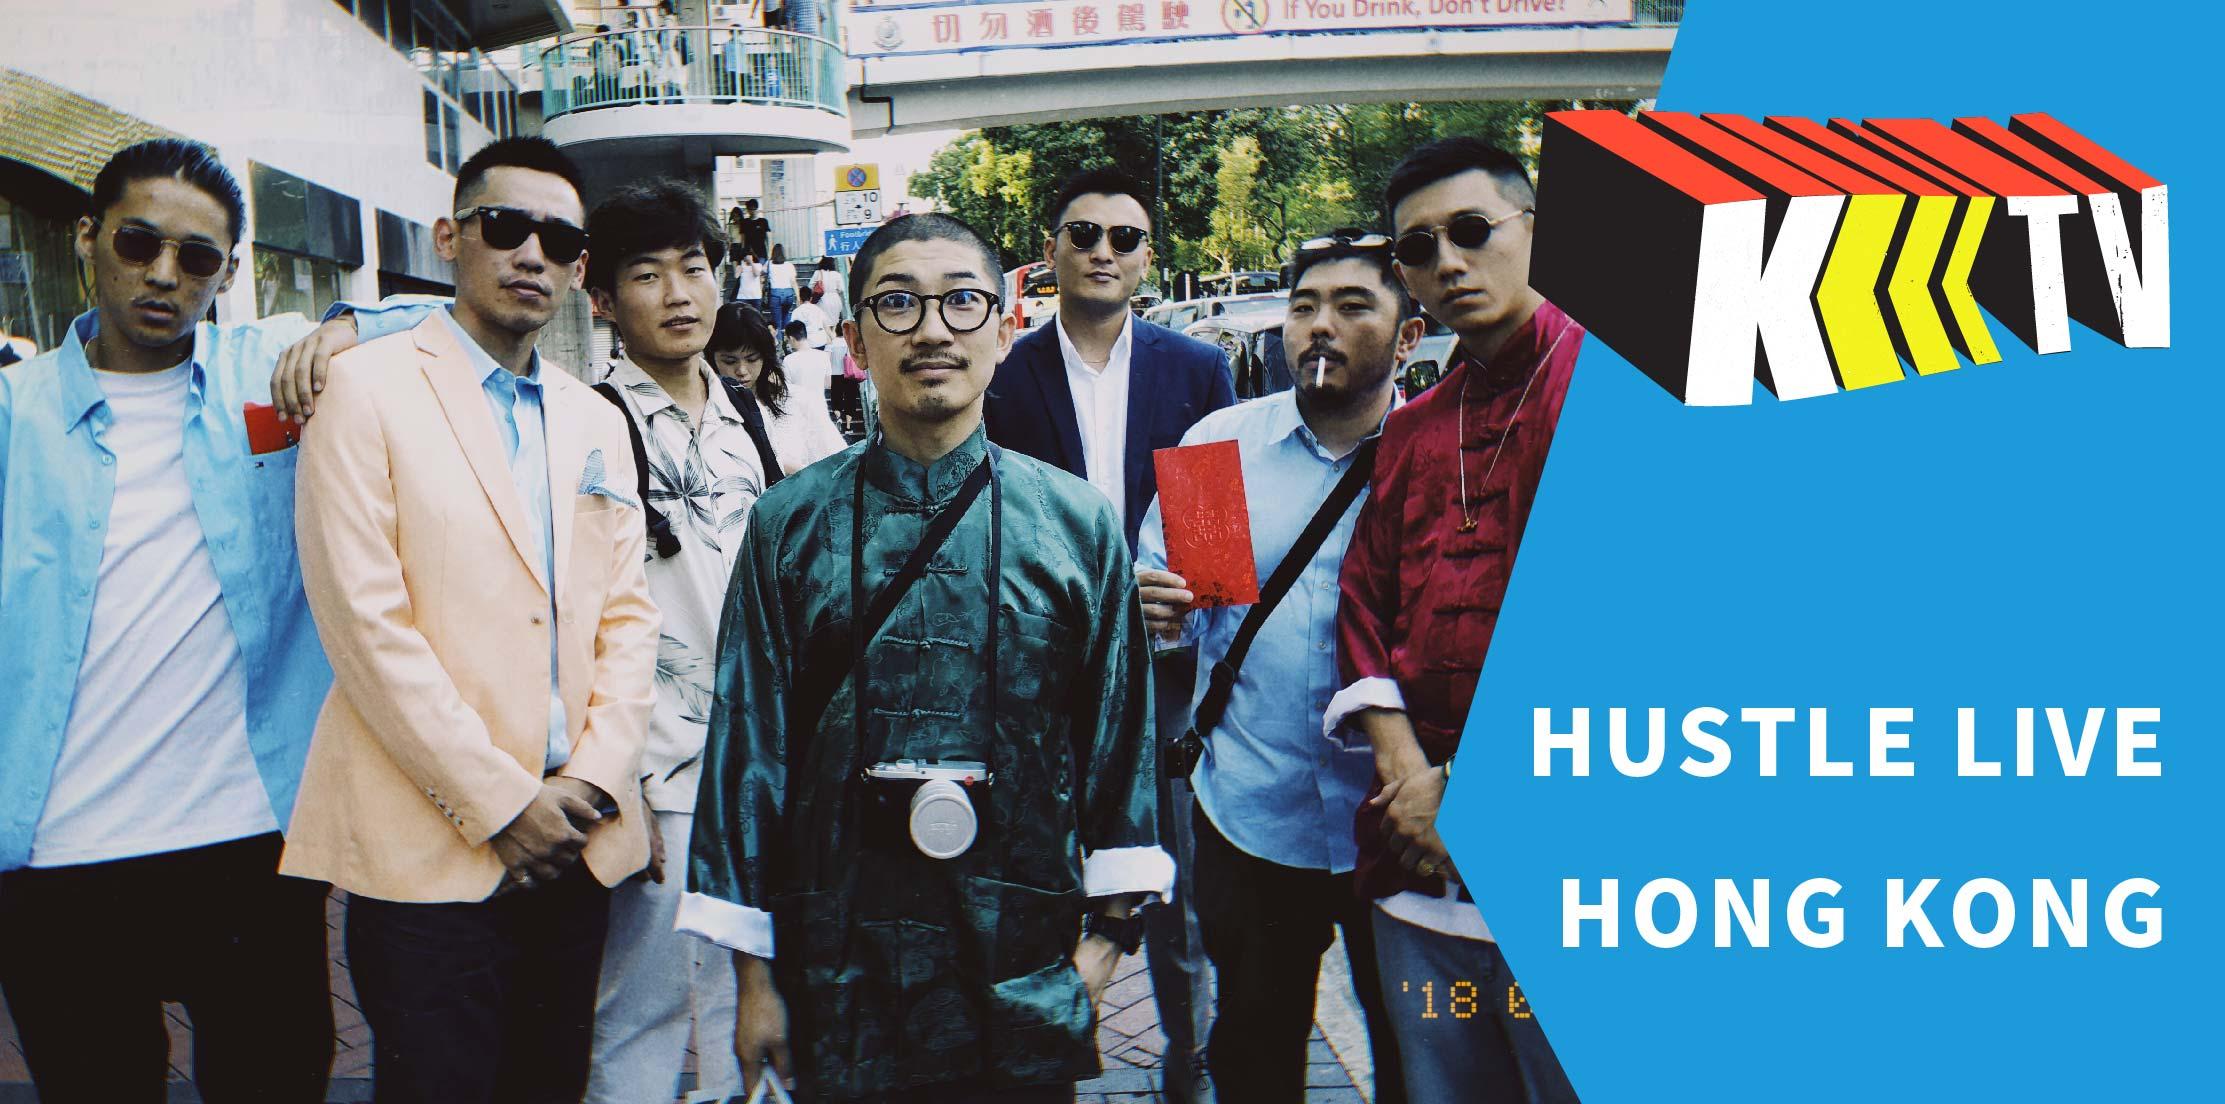 HustleLive – 职业滑手婚礼现场是什么样的?